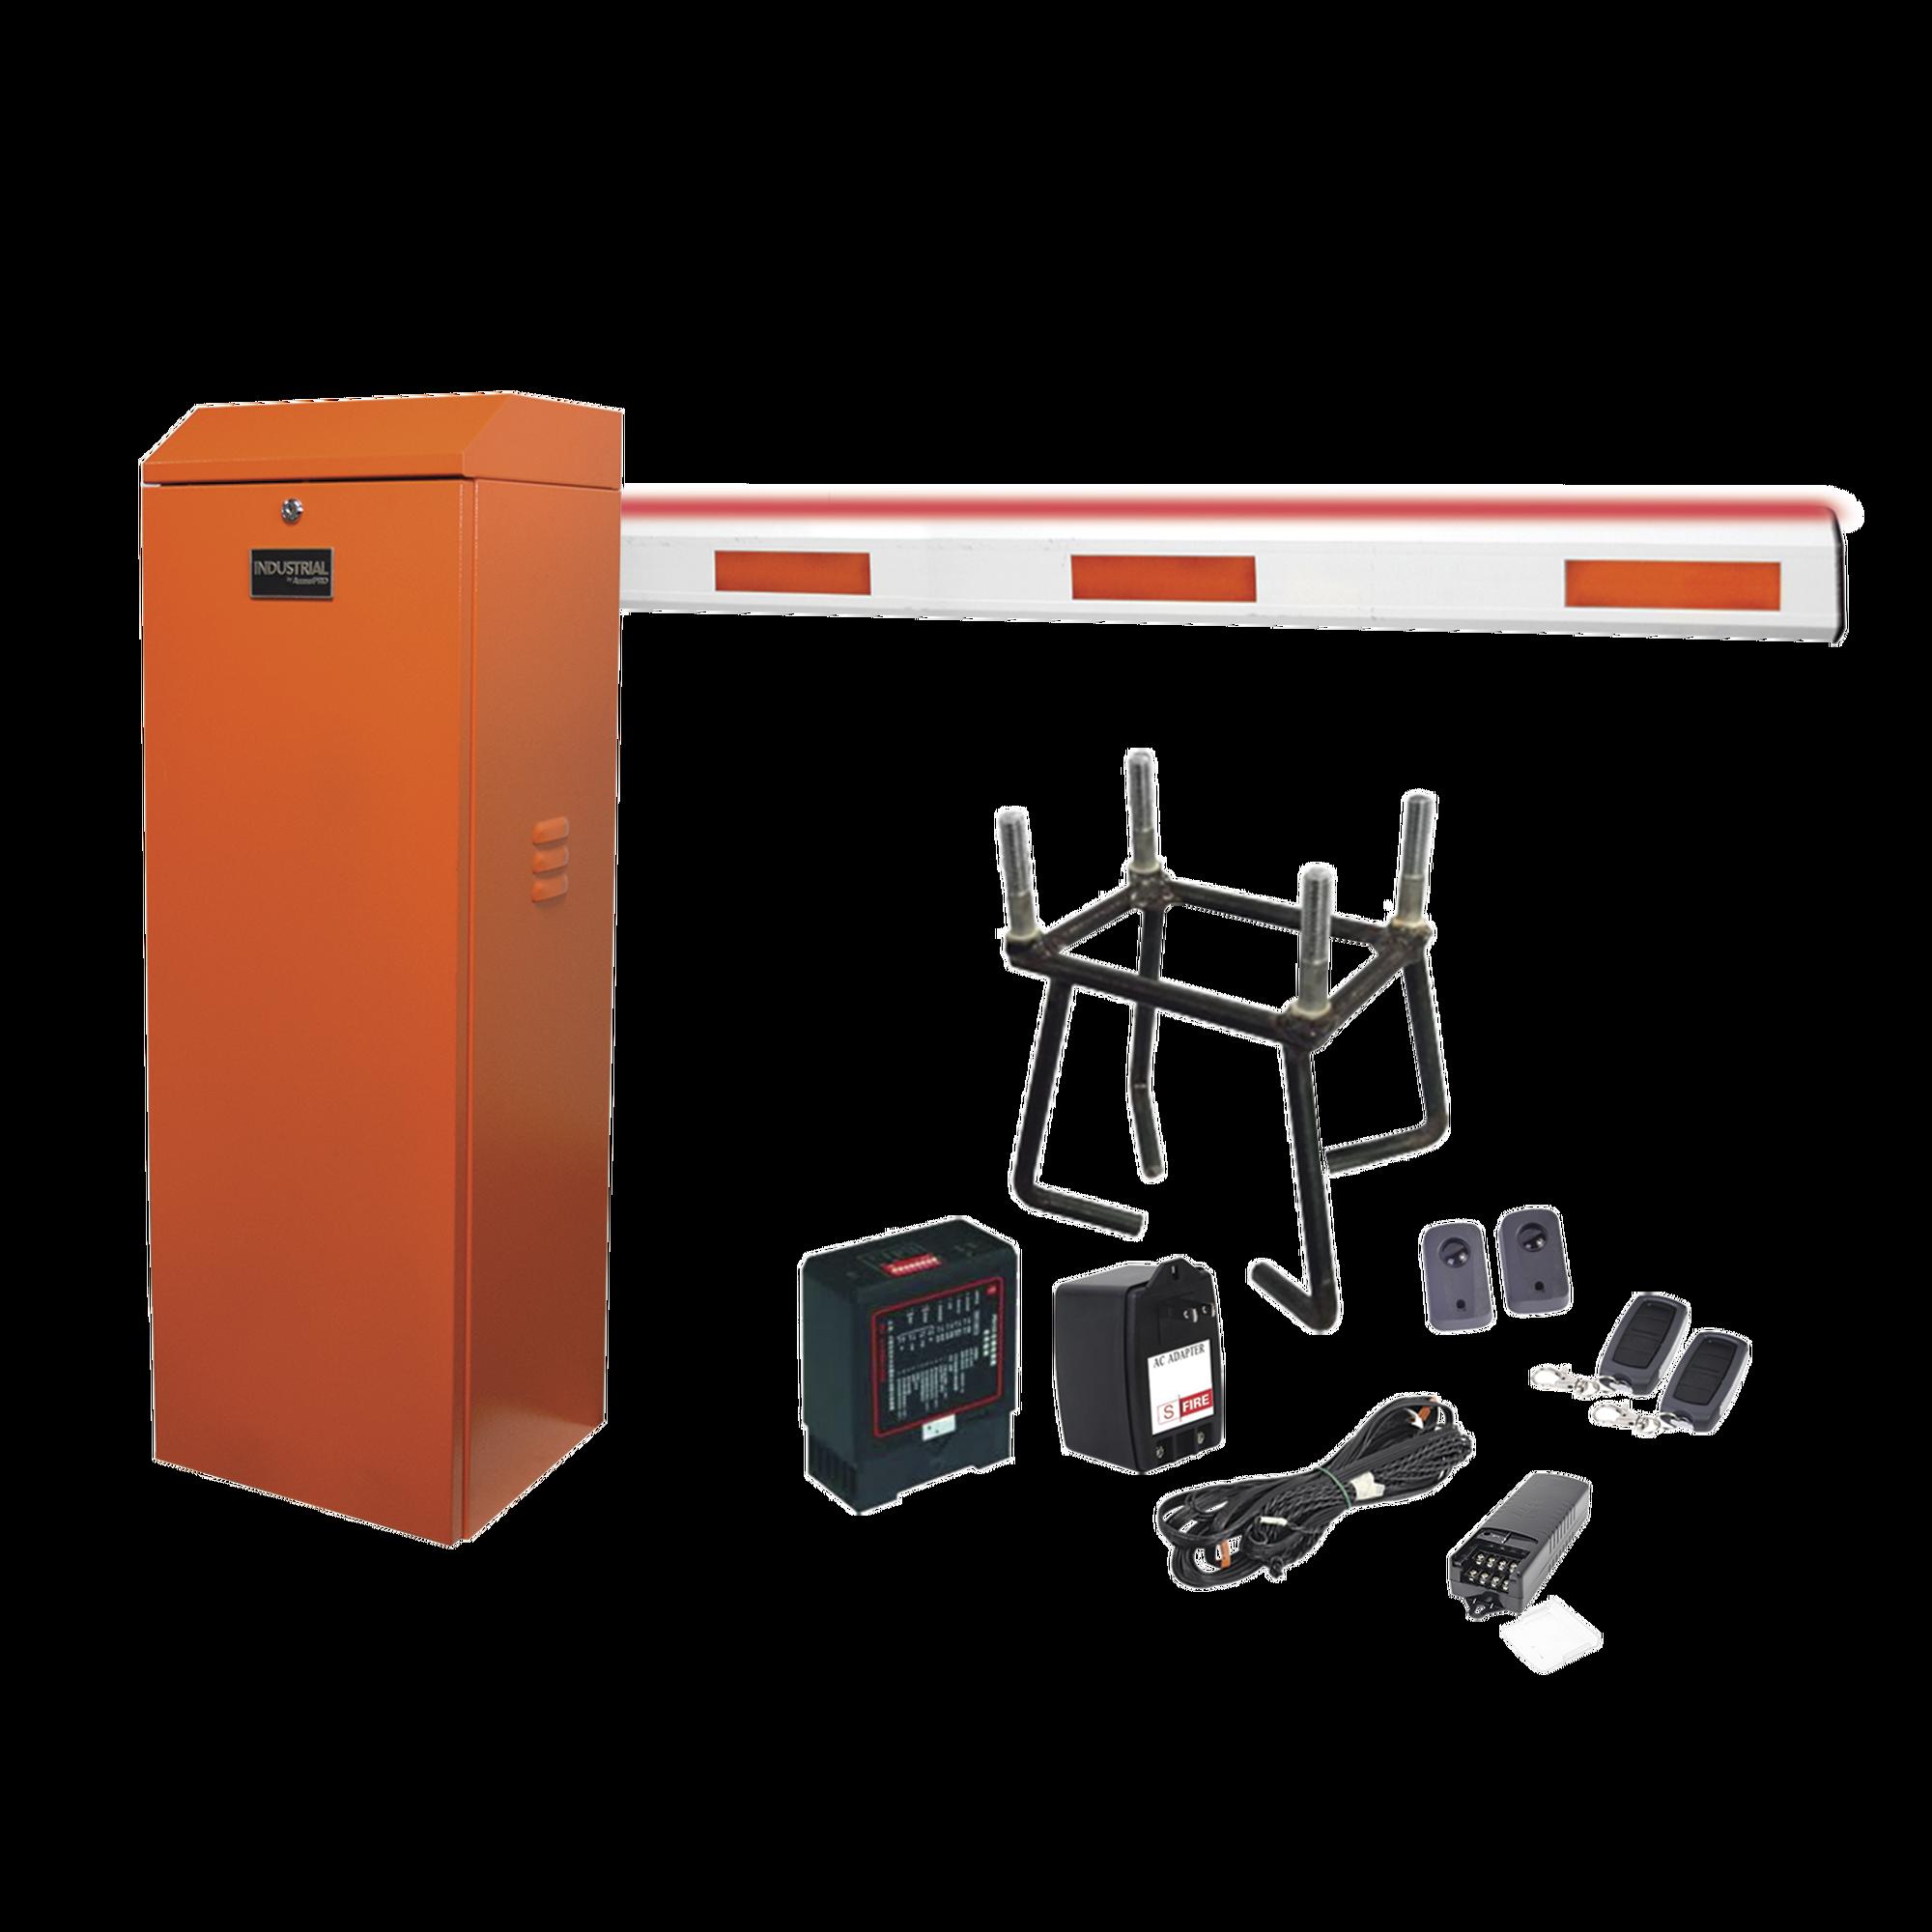 Kit COMPLETO Barrera Derecha XB ANARANJADA / 5M / Inluminacion LED Rojo-Verde / Incluye Sensor de masa, Transformador, Lazo, Ancla, Fotoceldas 2 Controles Inalambricos